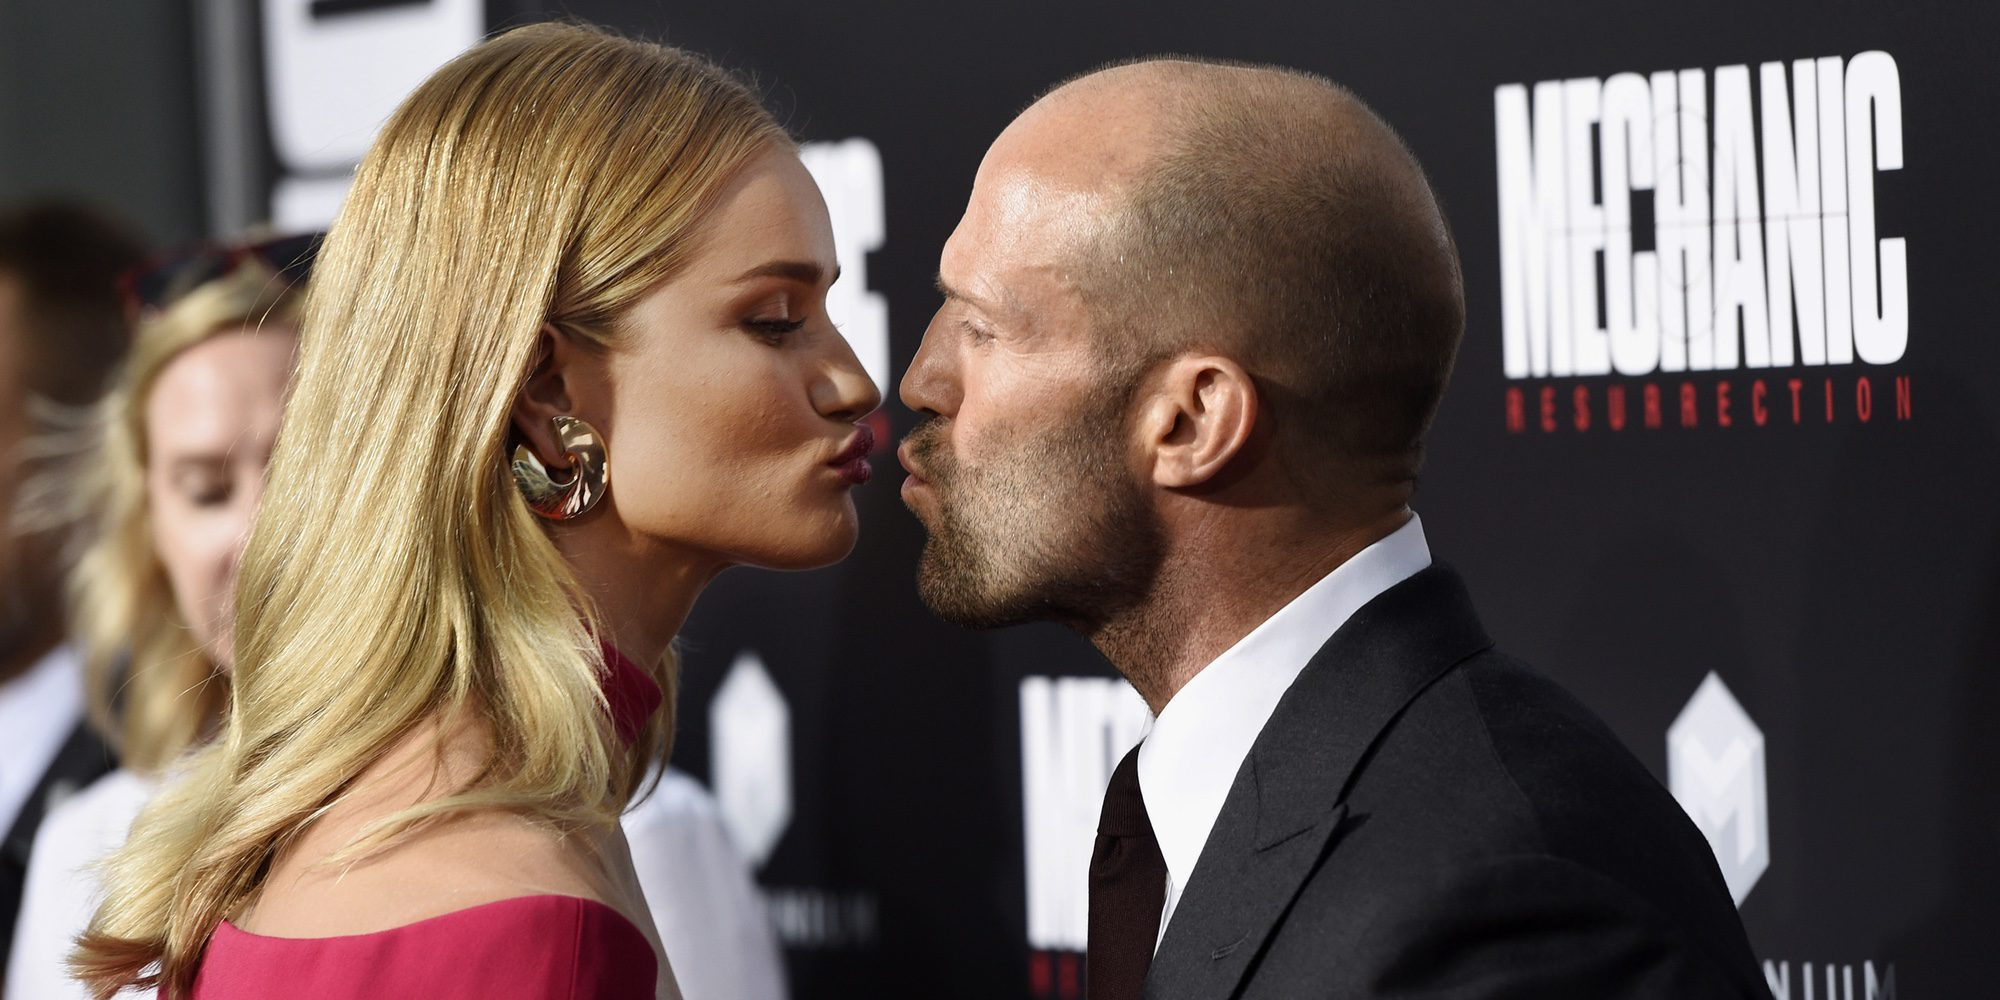 Jason Statham y Rosie Huntington-Whiteley pasean su amor por la alfombra roja de 'Mechanic: Resurrection'